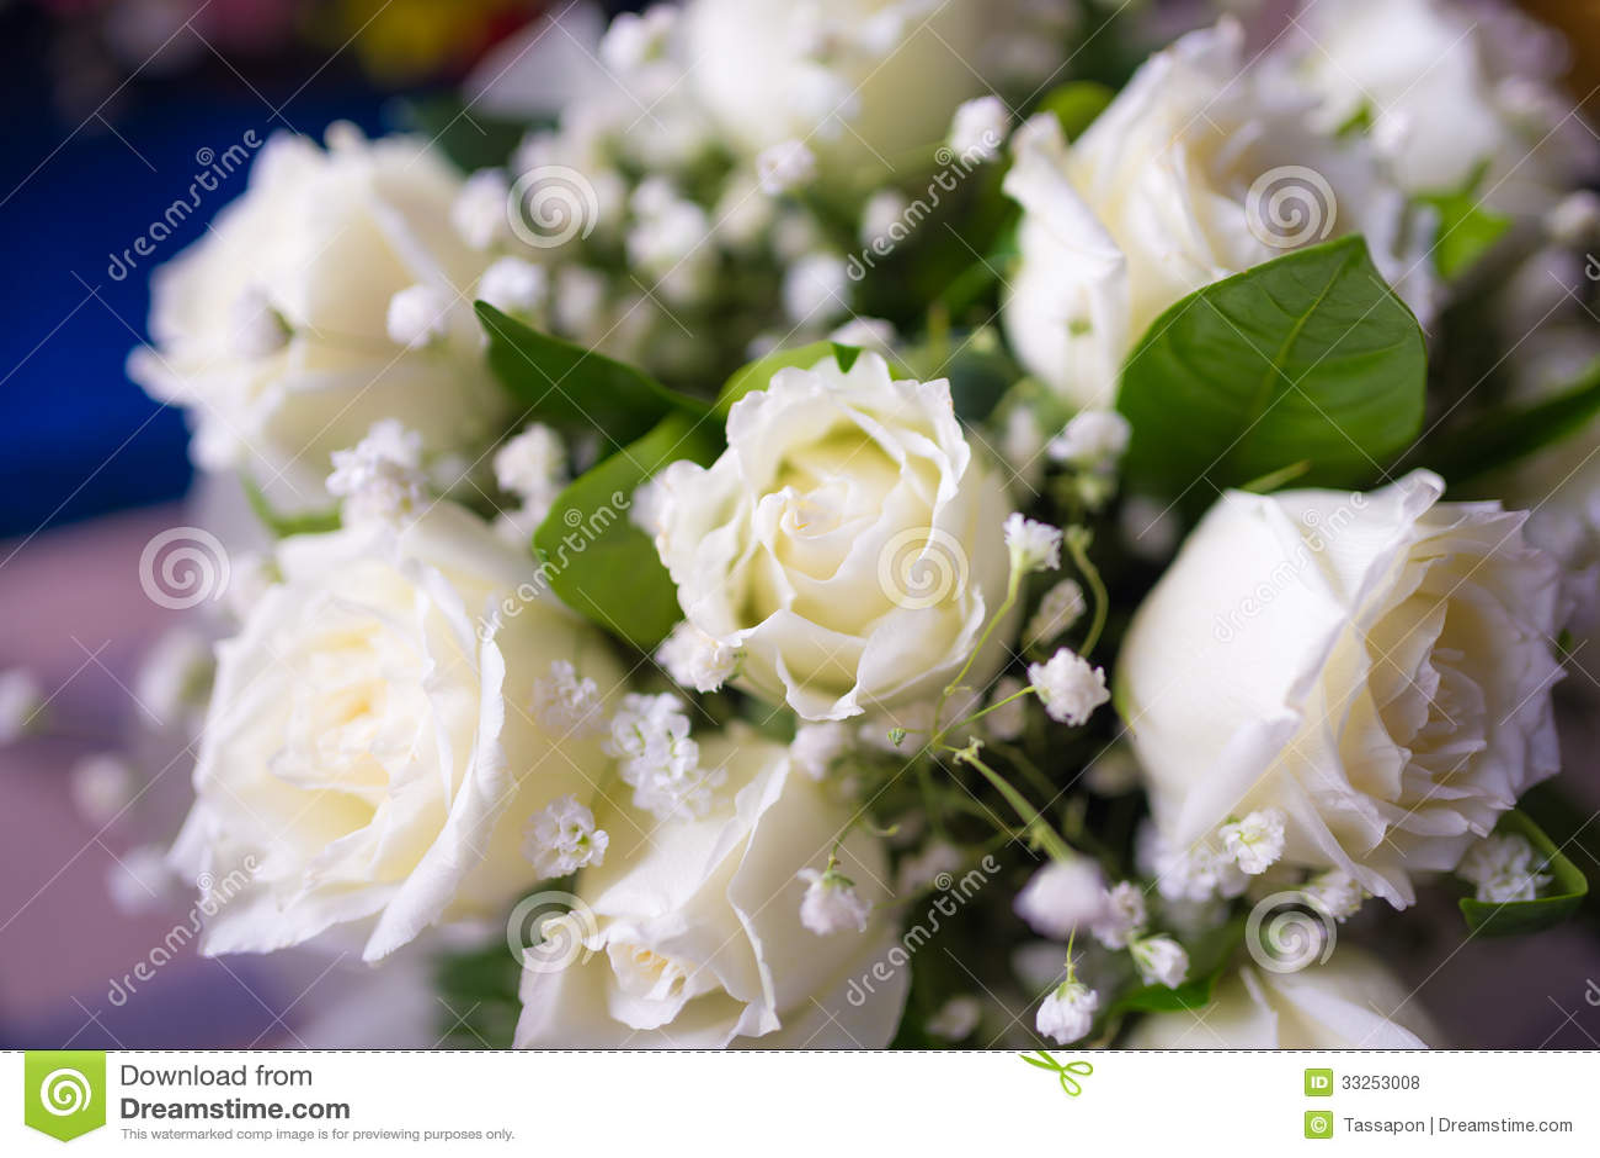 Bouquet of white rose flowers stock photo 33253008 megapixl mightylinksfo